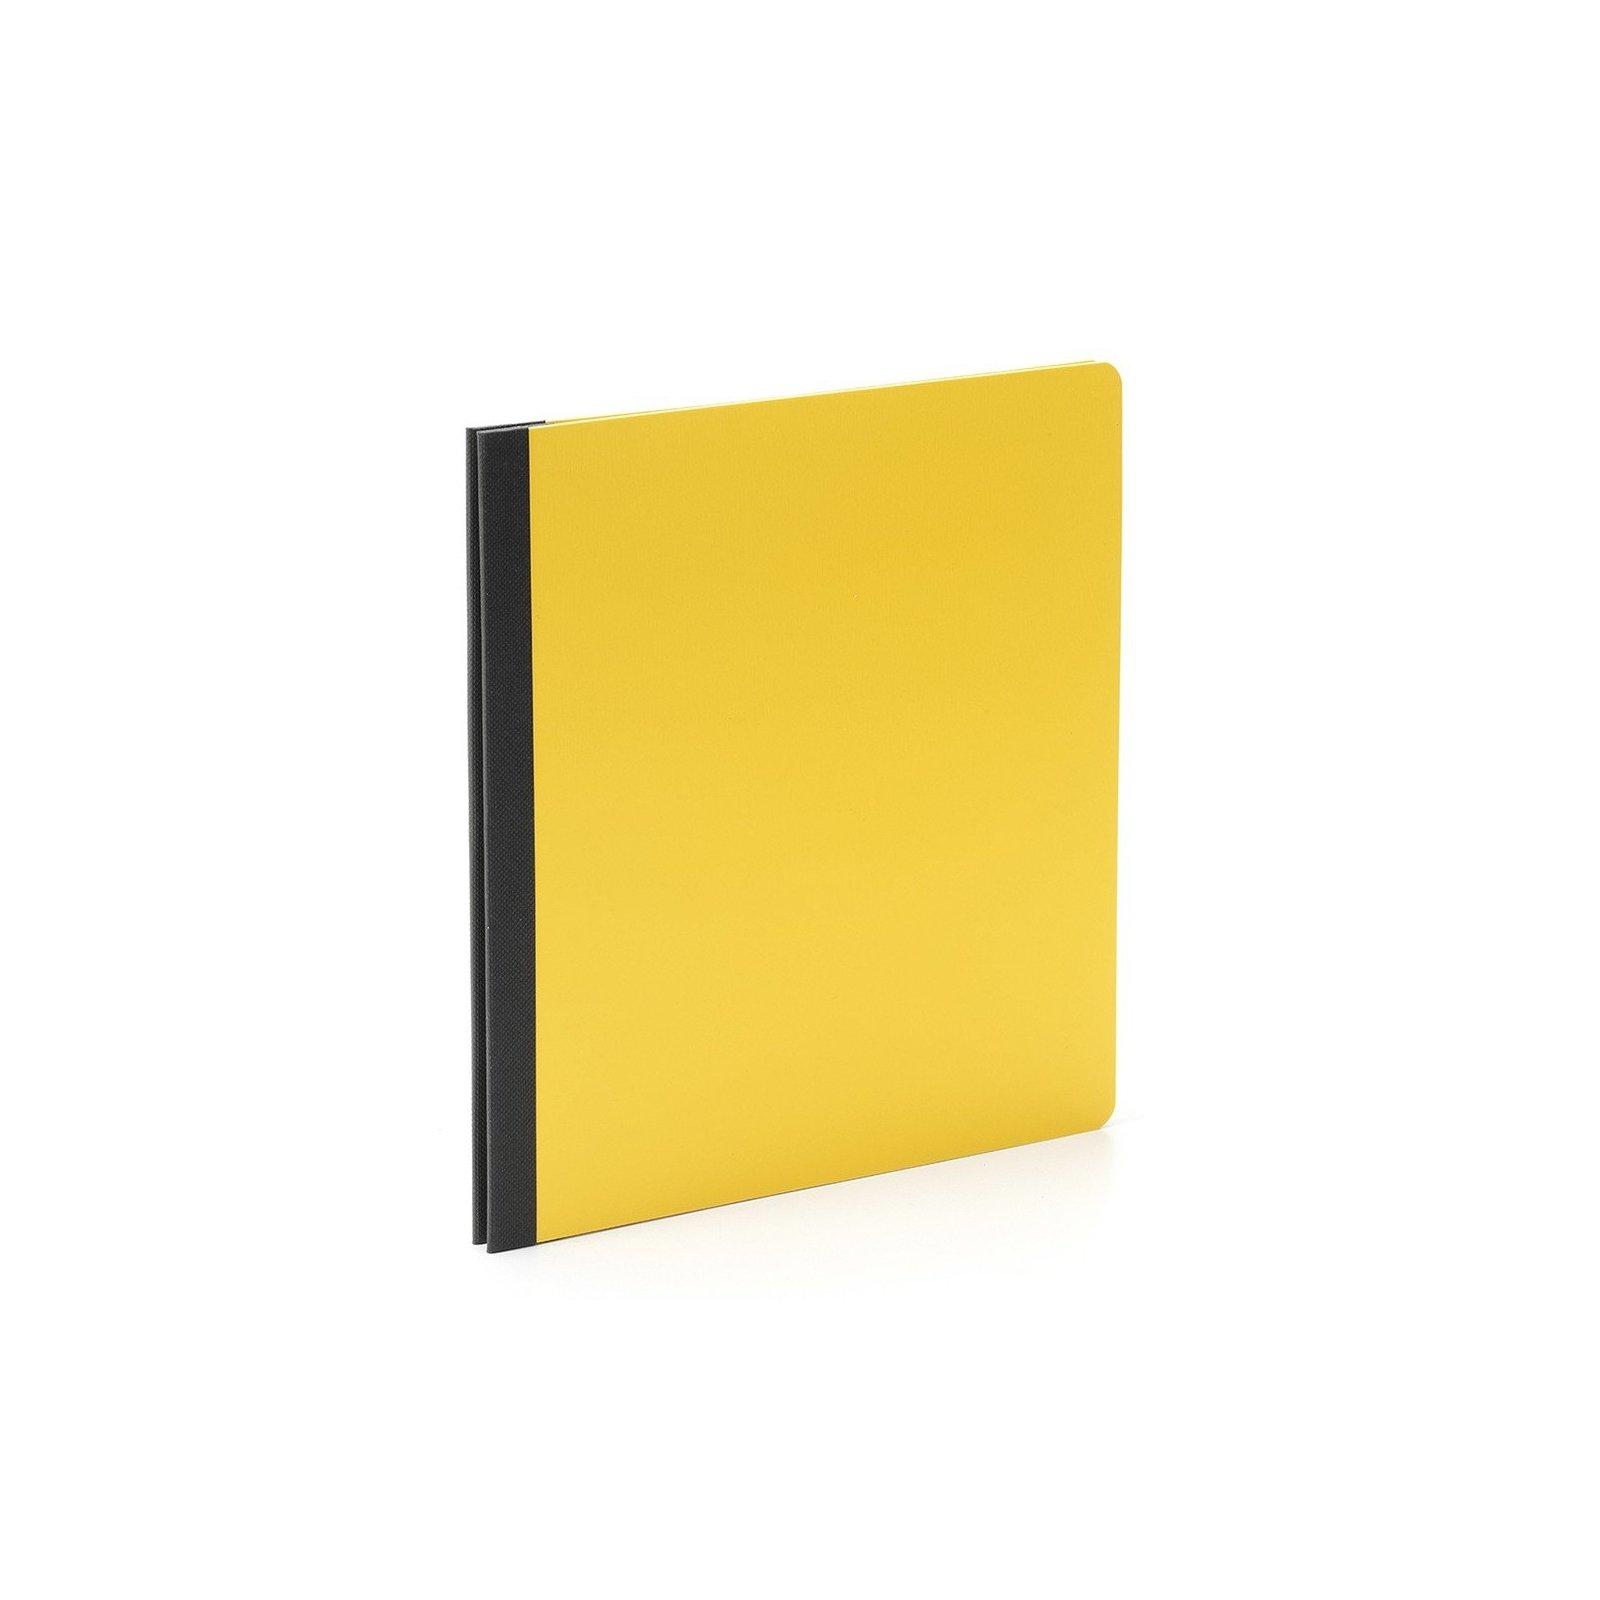 Flipbook - 15x20 - Yellow - Simple Stories